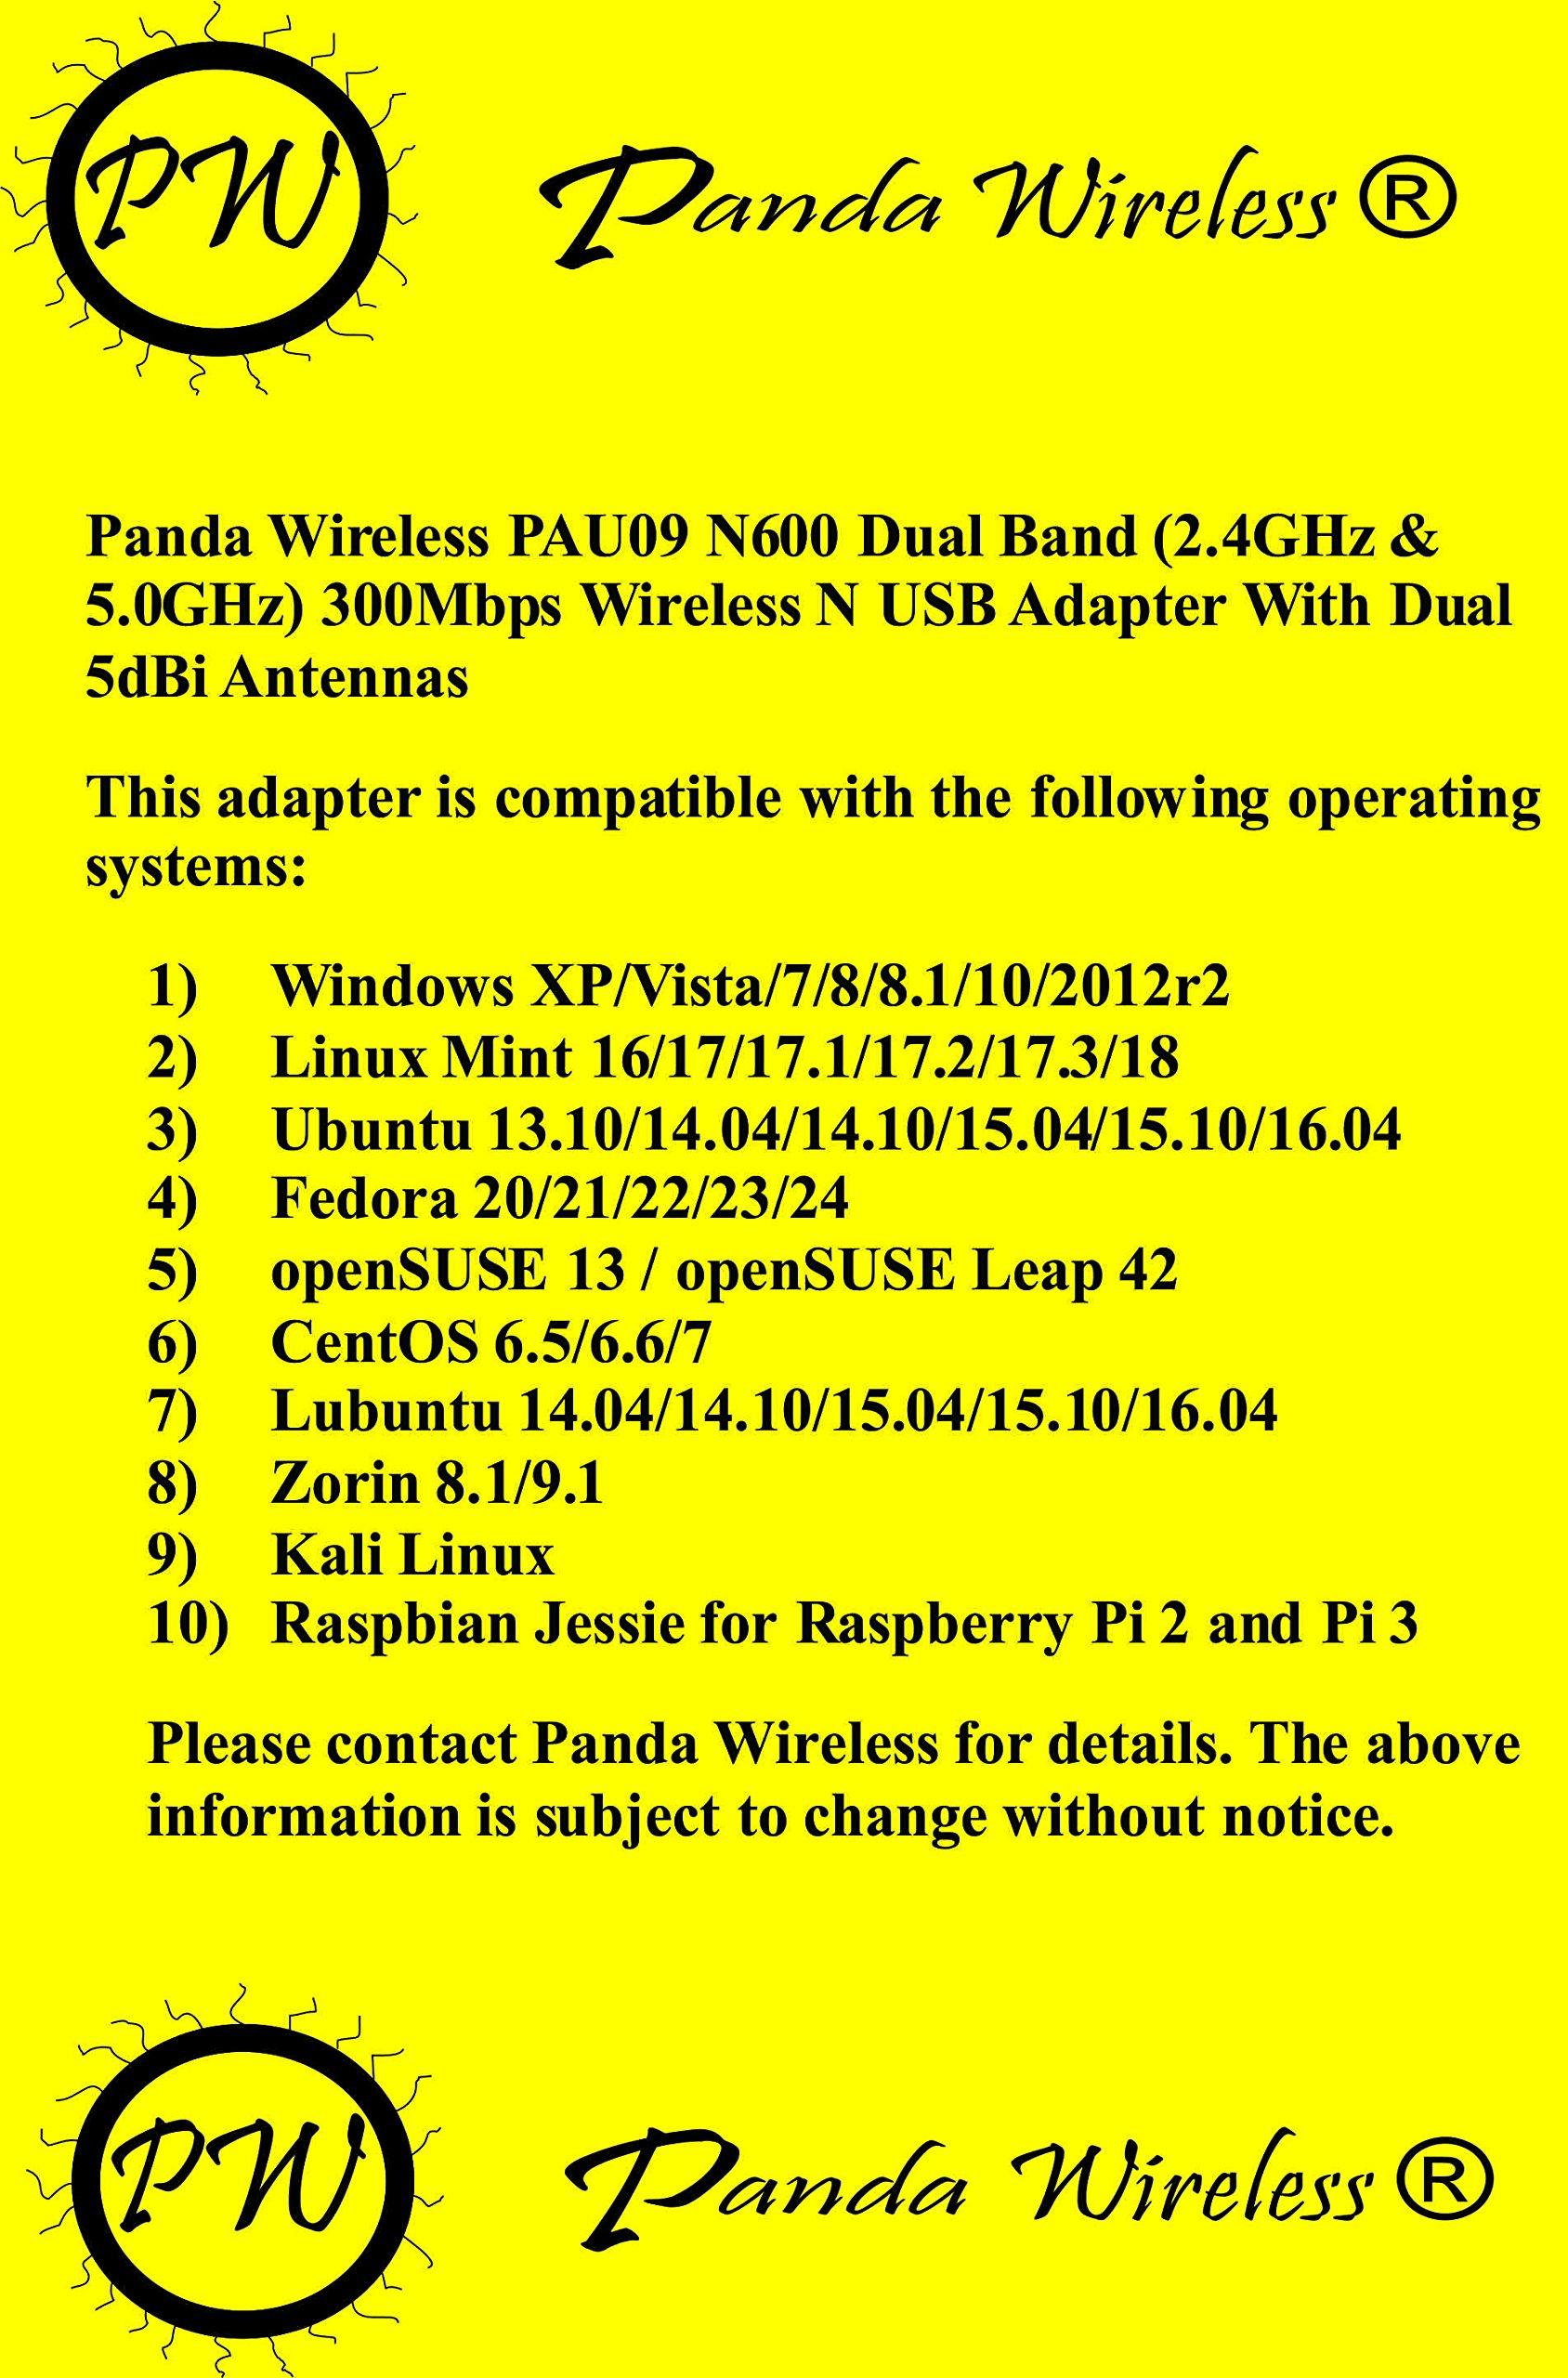 Panda Wireless PAU09 N600 Dual Band (2.4GHz and 5GHz) Wireless N USB Adapter W/ Dual 5dBi Antennas - Windows XP/Vista/7/8/8.1/10, Mint, Ubuntu, openSUSE, Fedora, CentOS, Kali Linux and Raspbian by Panda Wireless (Image #2)